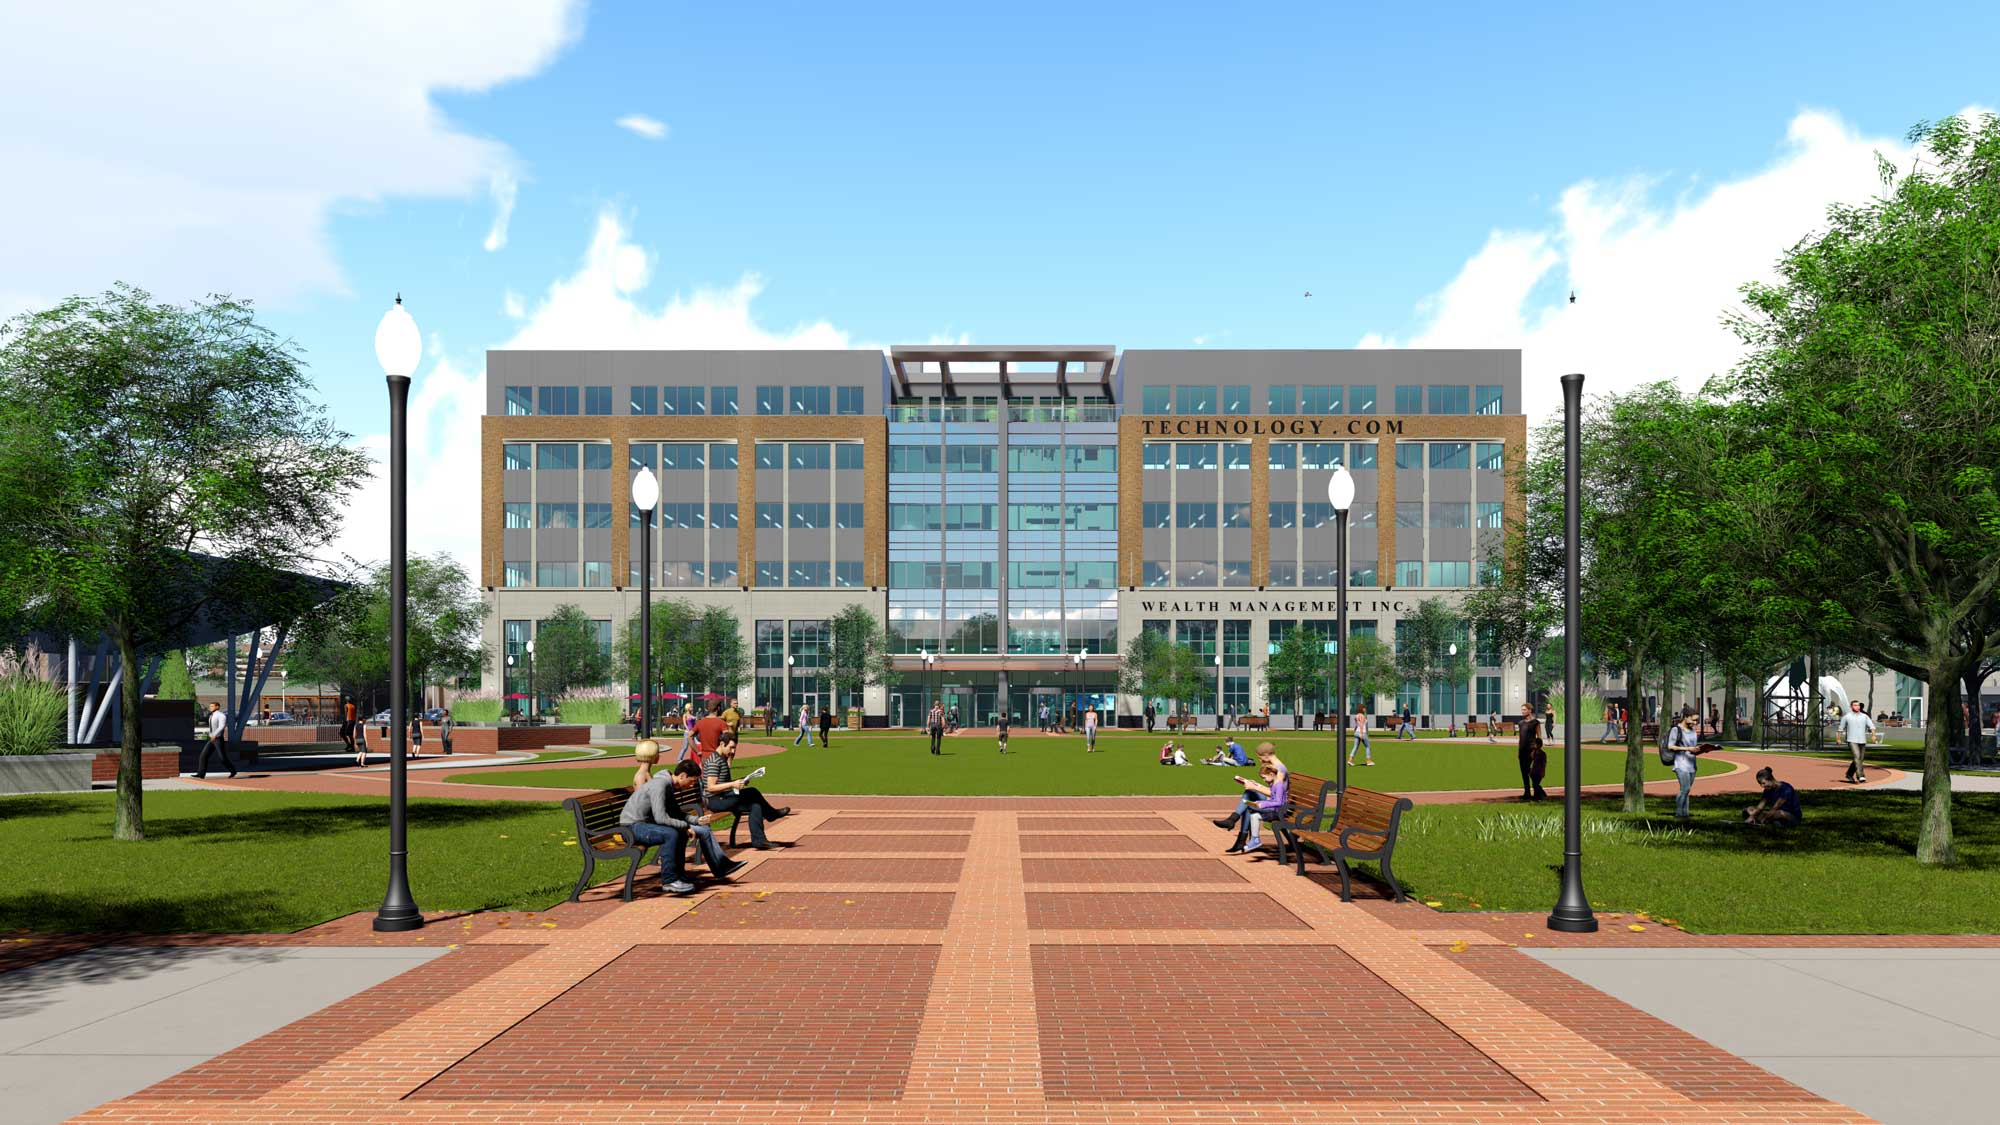 Royal Oak City Center complex exterior rendering